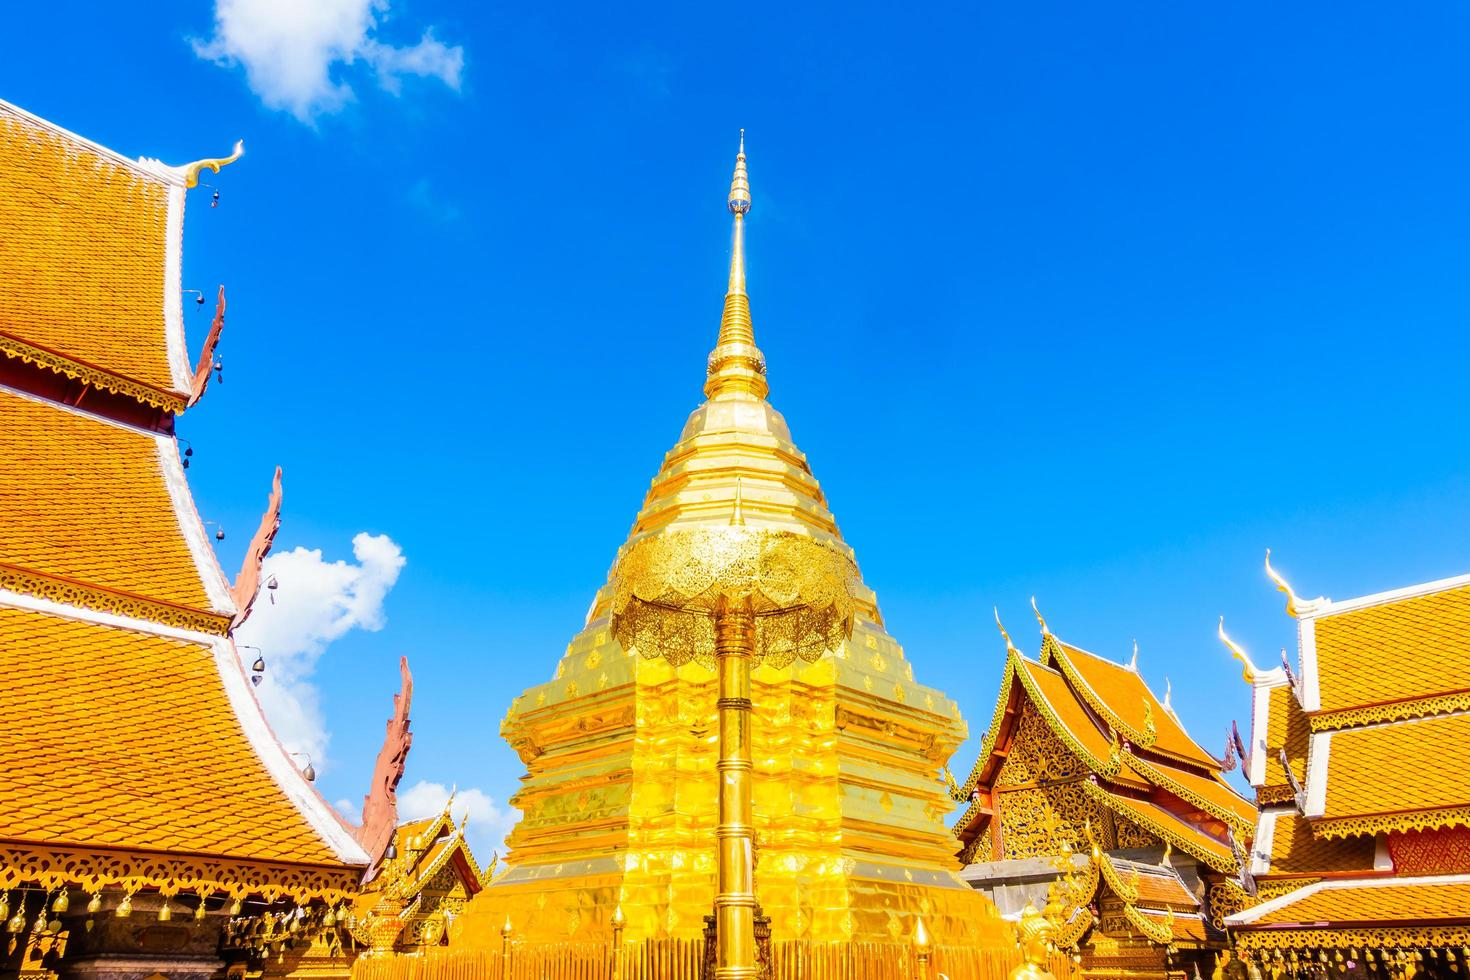 pagoda de oro en wat phrathat doi suthep, hito de chiangmai en tailandia foto